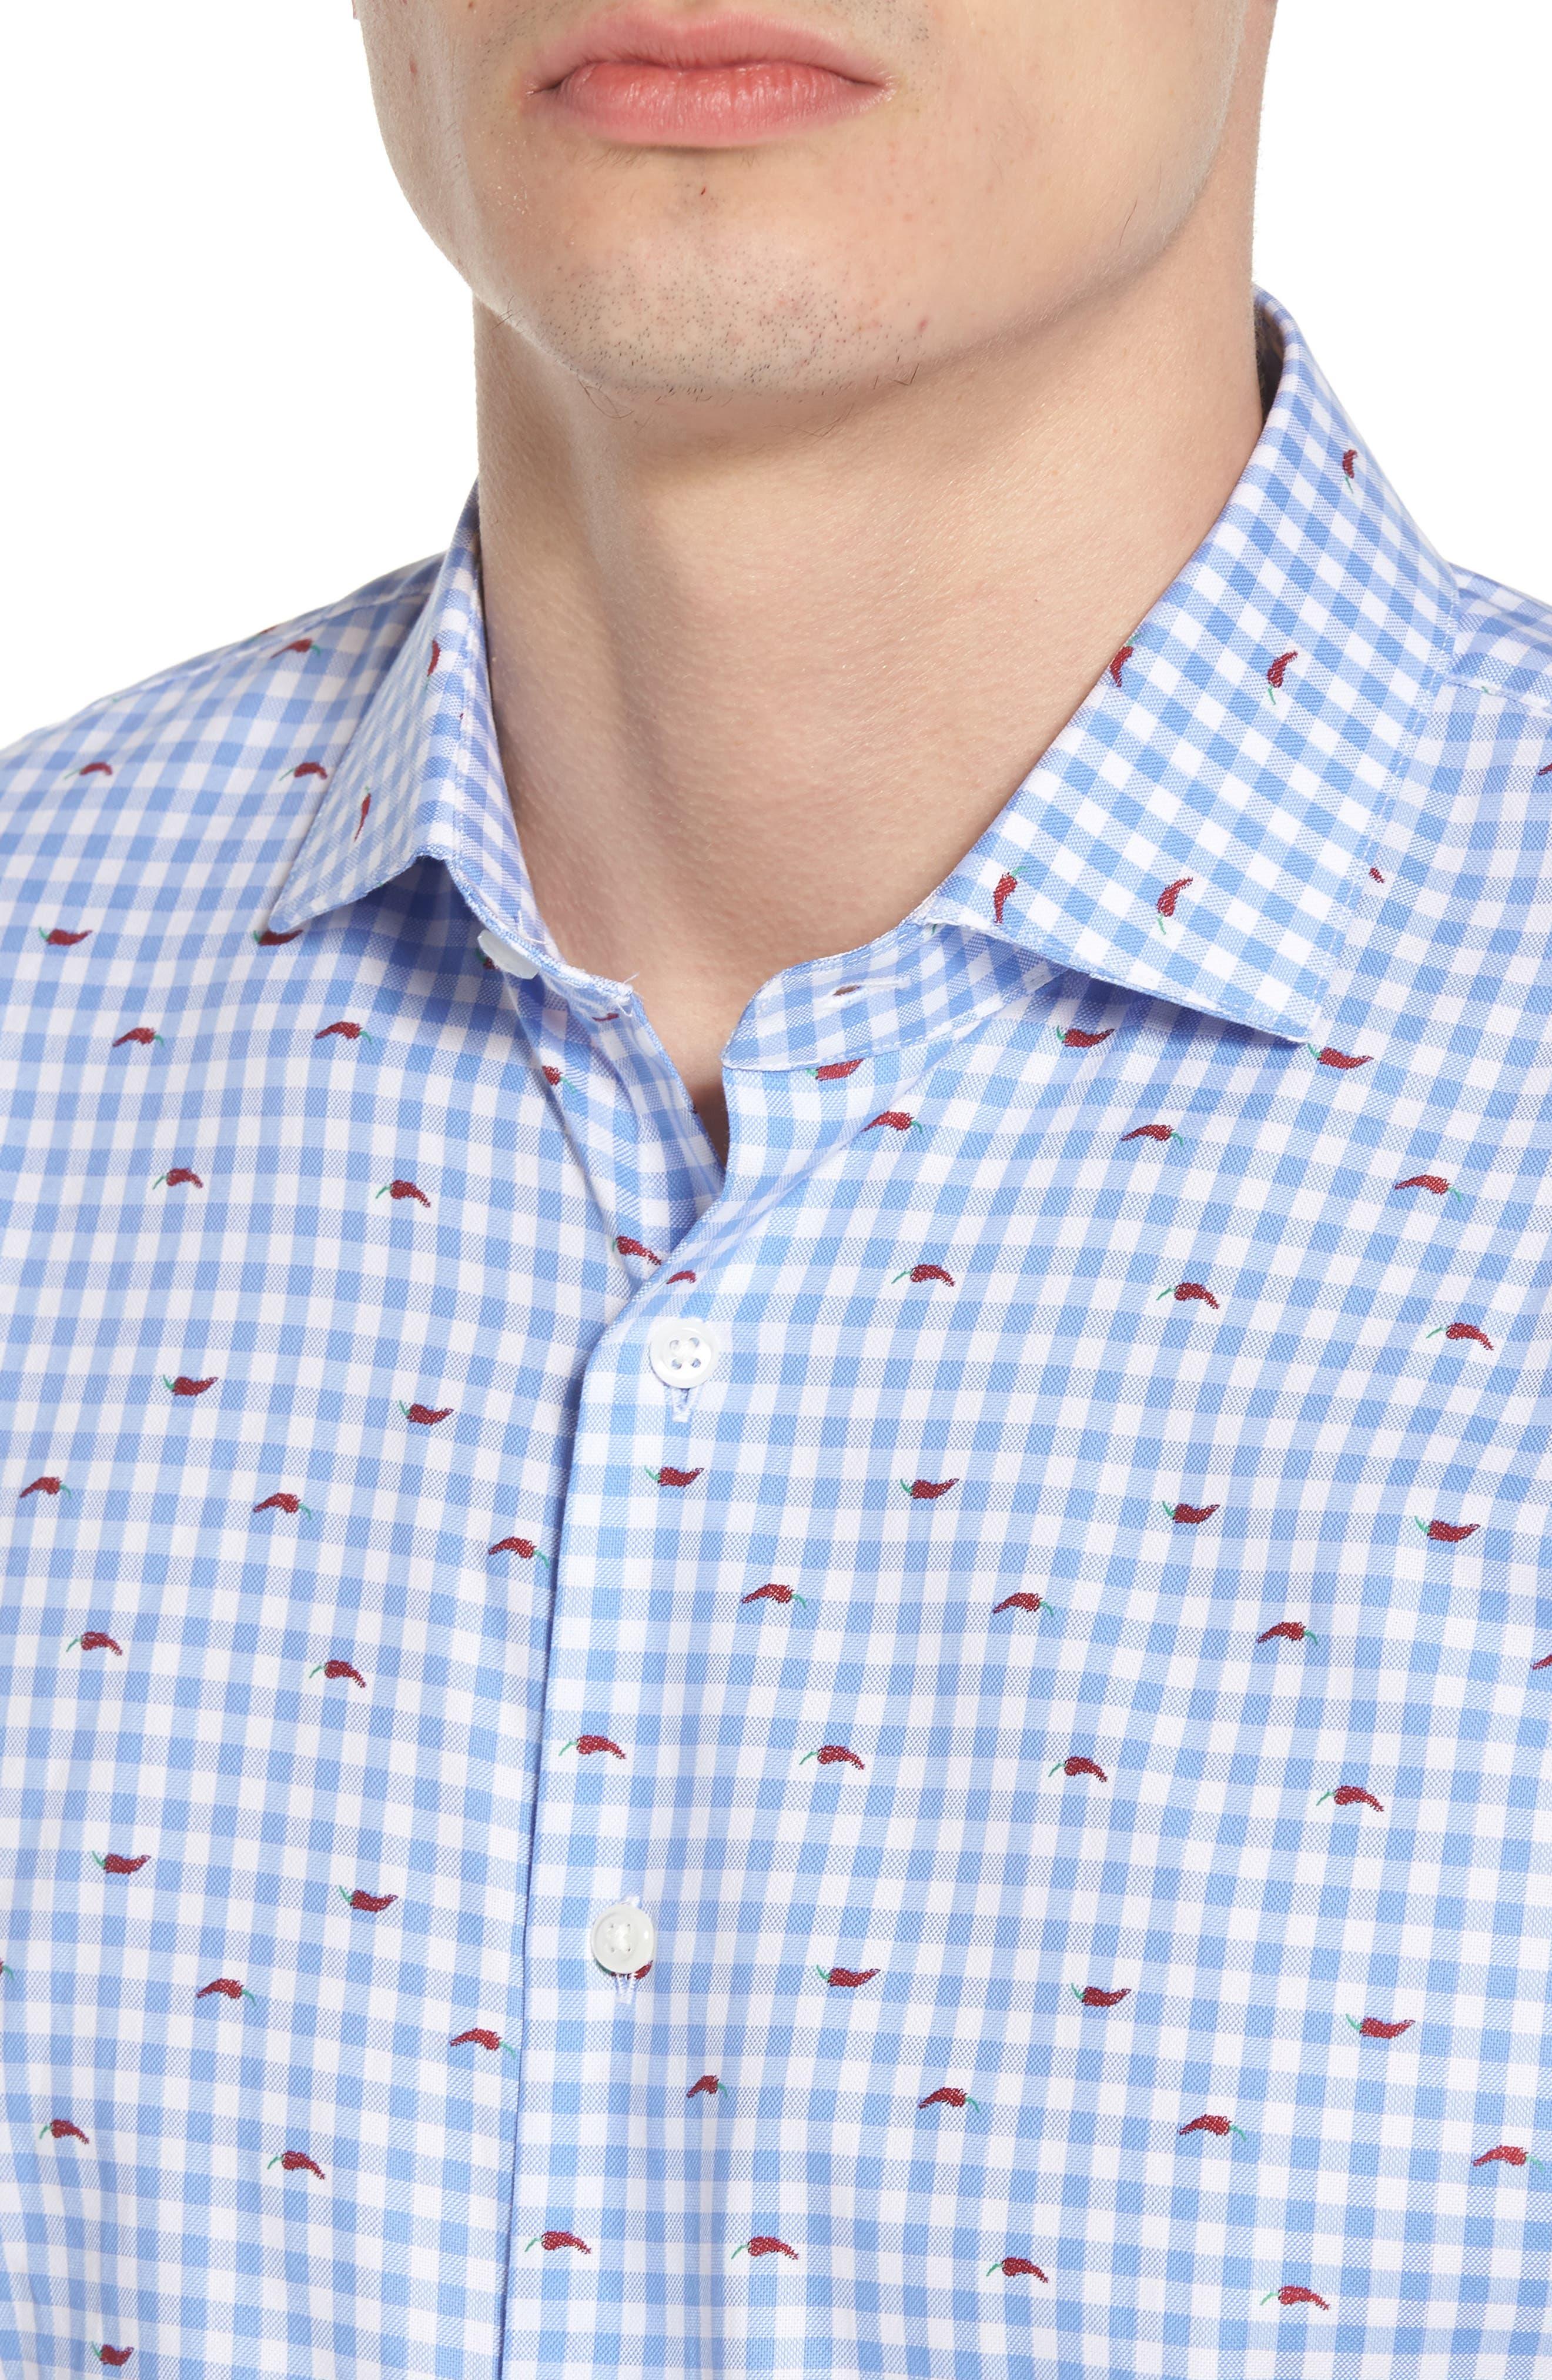 Trim Fit Gingham Chili Pepper Dress Shirt,                             Alternate thumbnail 2, color,                             Blue Hydrangea